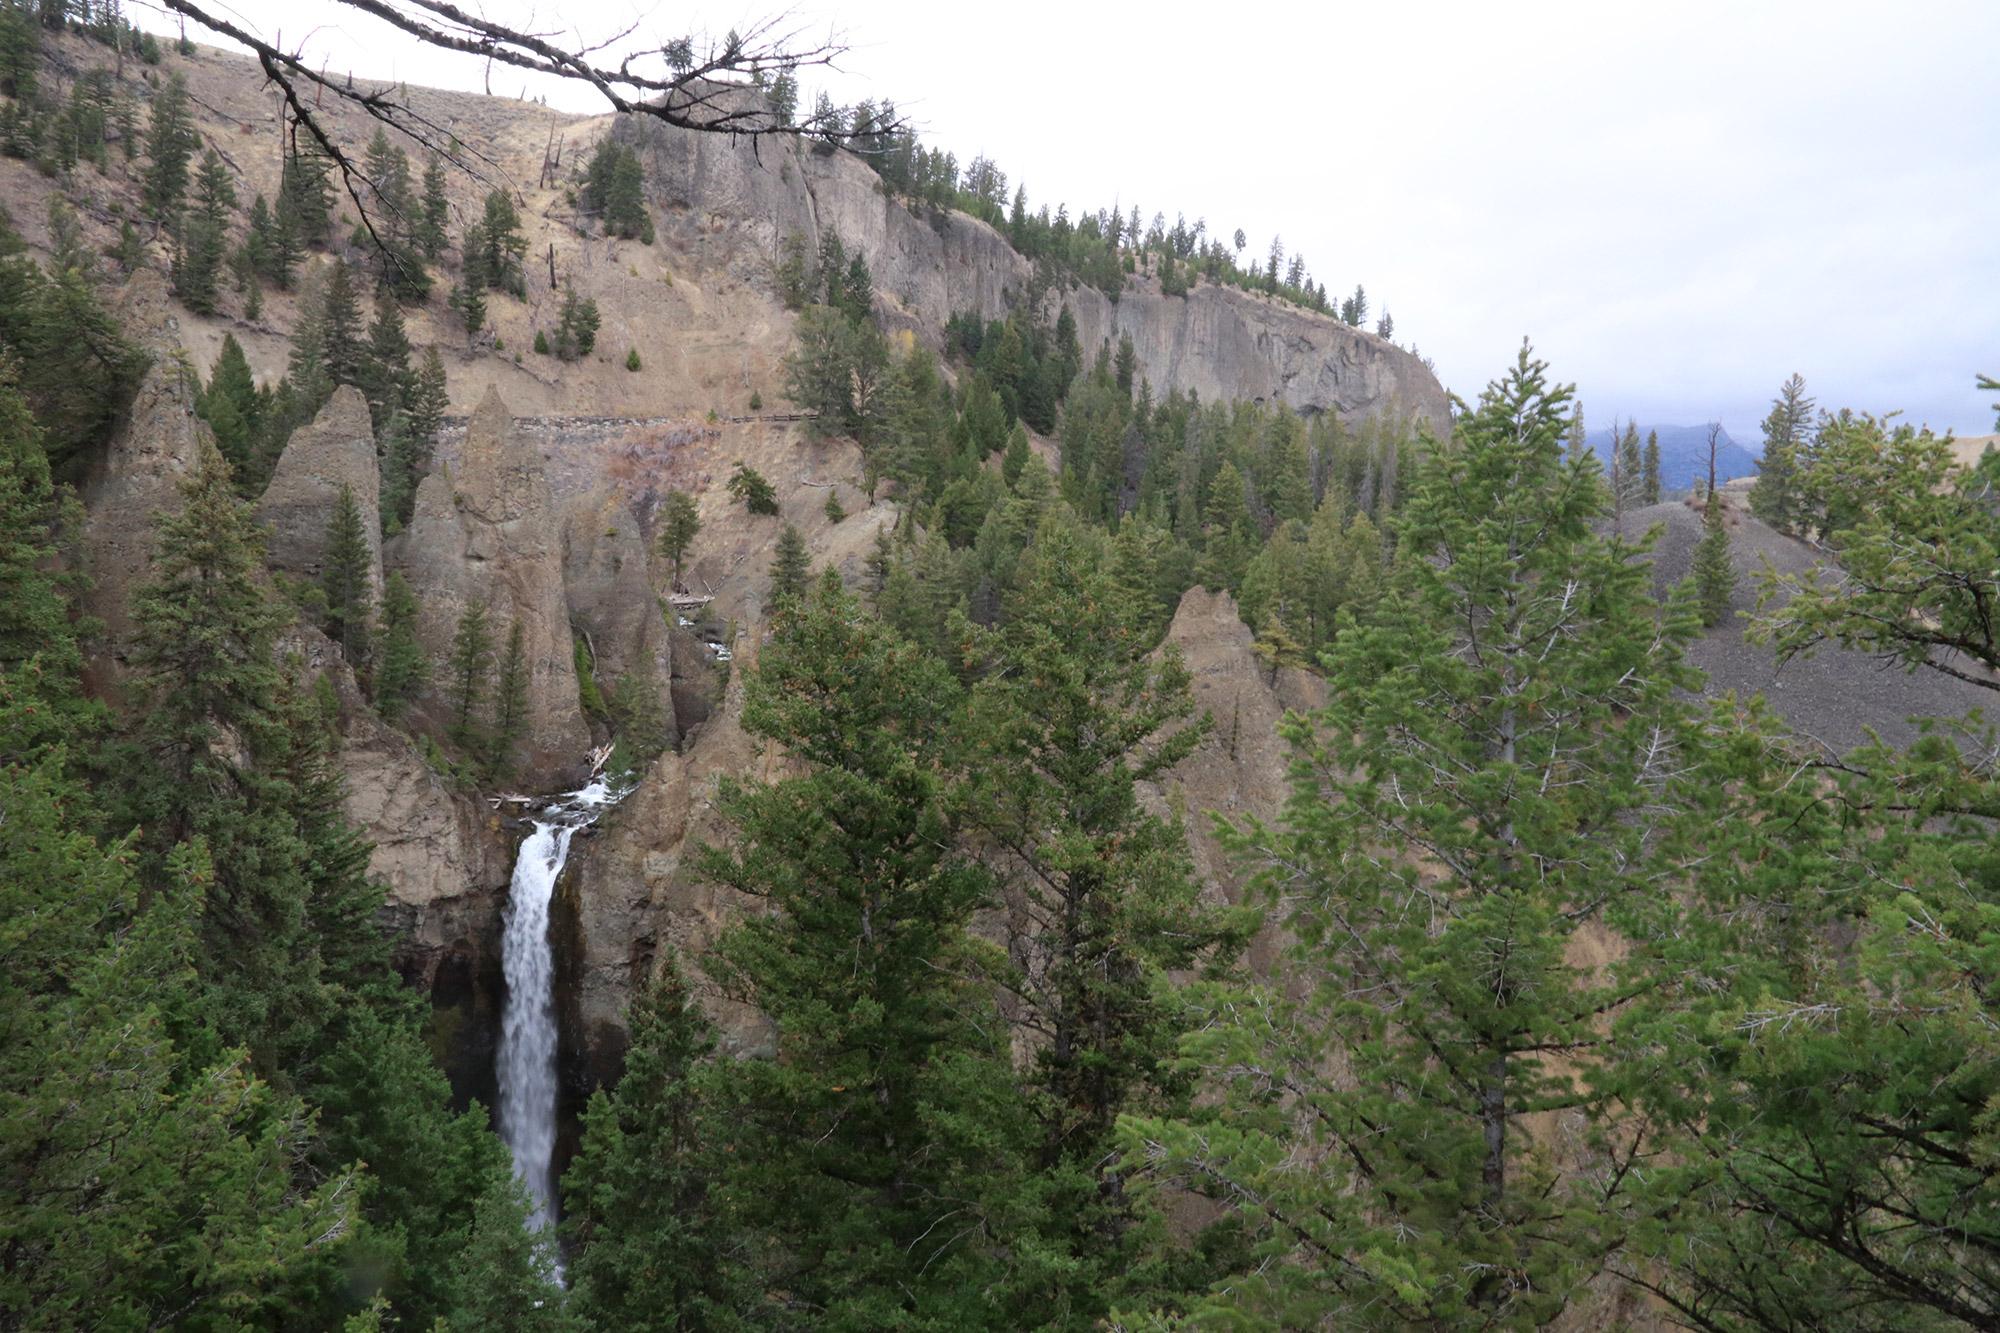 Amerika dag 4 - Yellowstone National Park - Tower Fall